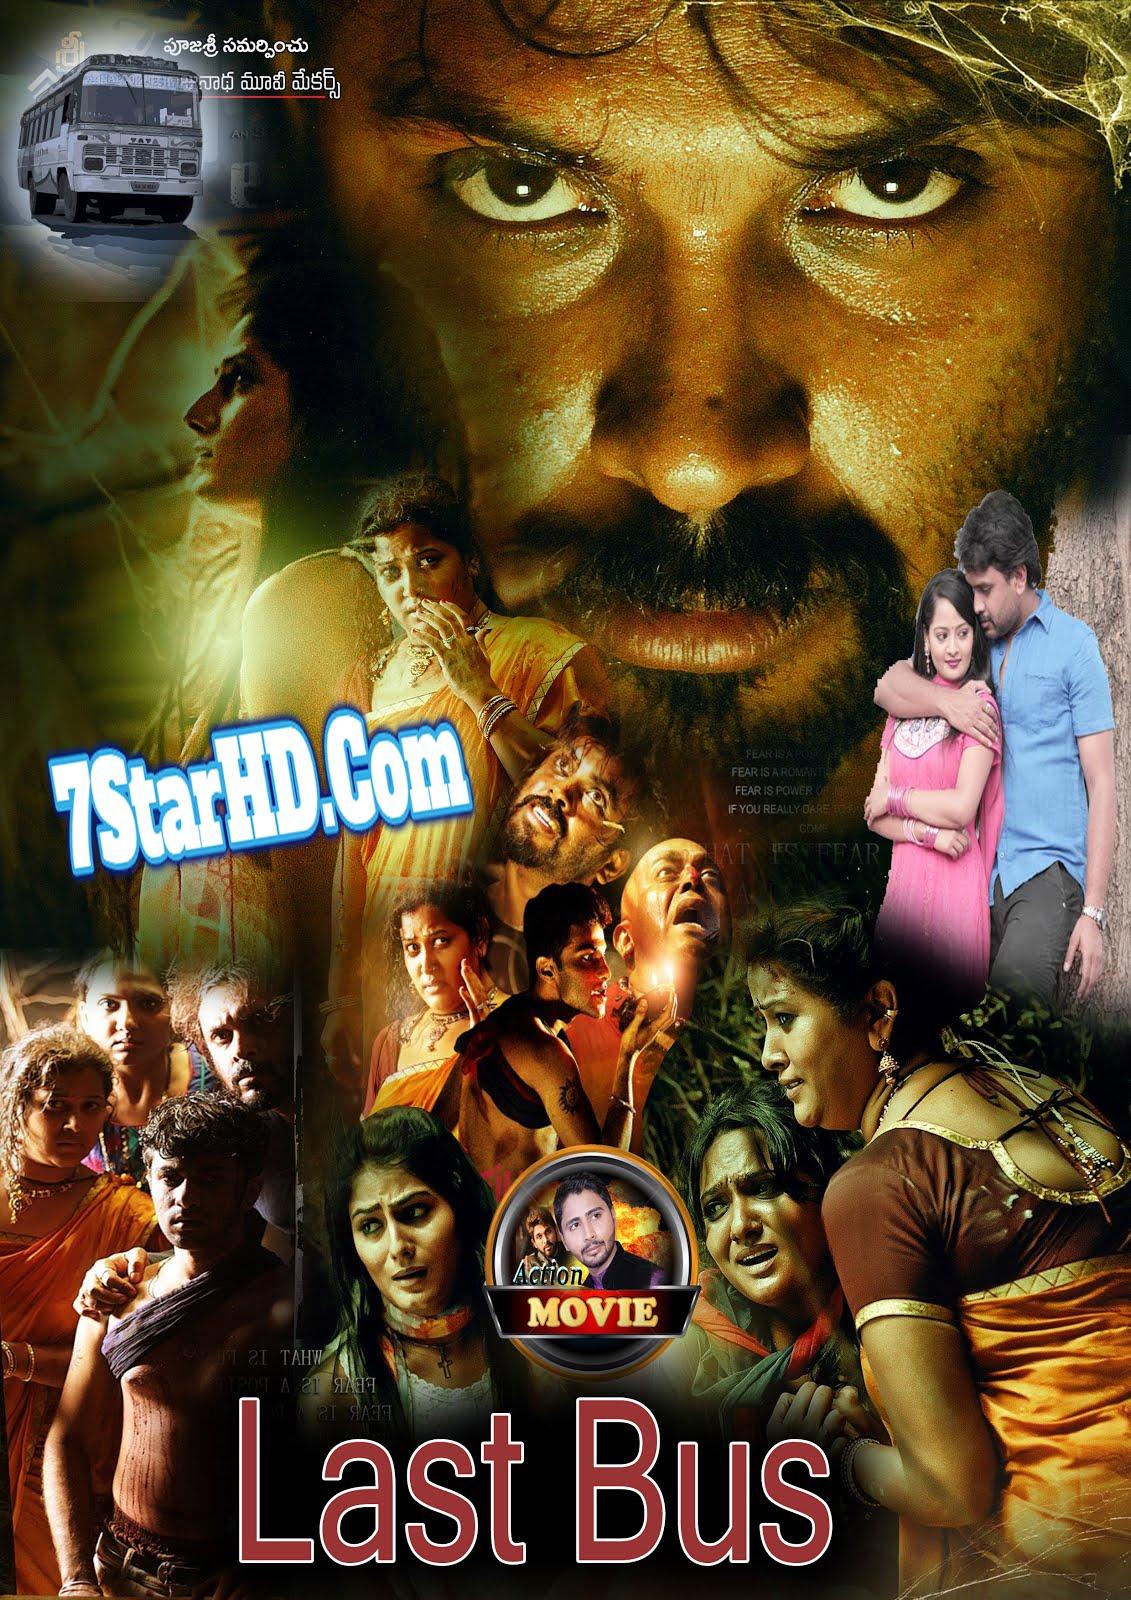 Last Bus (2018) Hindi Dubbed 350MB HDTV 480p x264